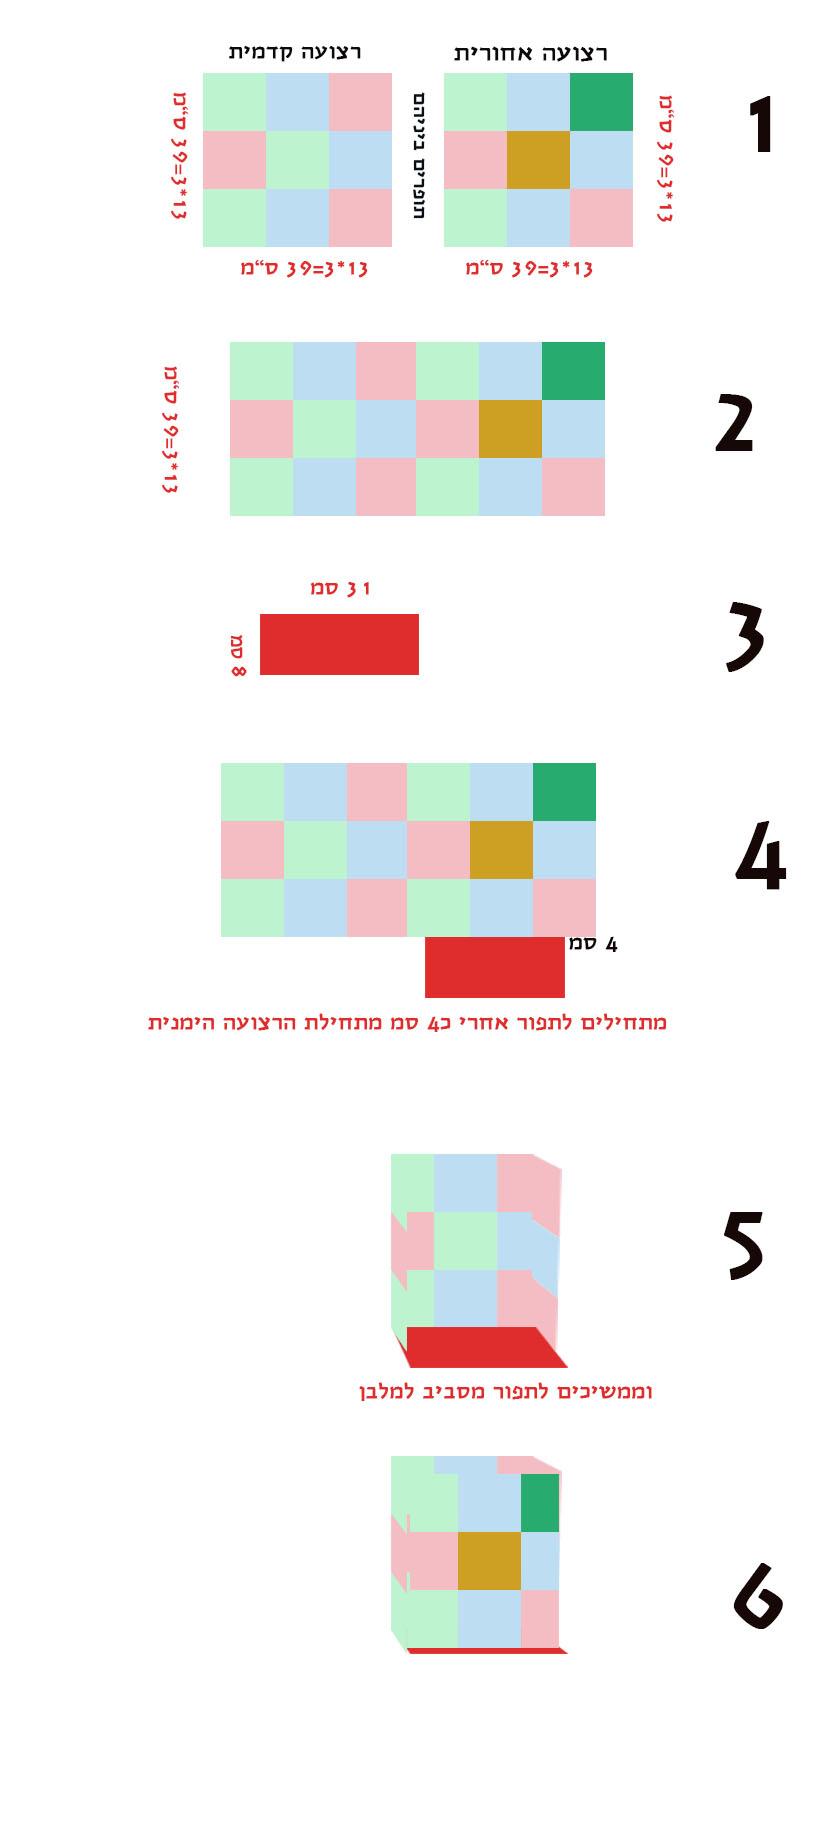 Untitled 2 - איך תופרים תיק פשוט?